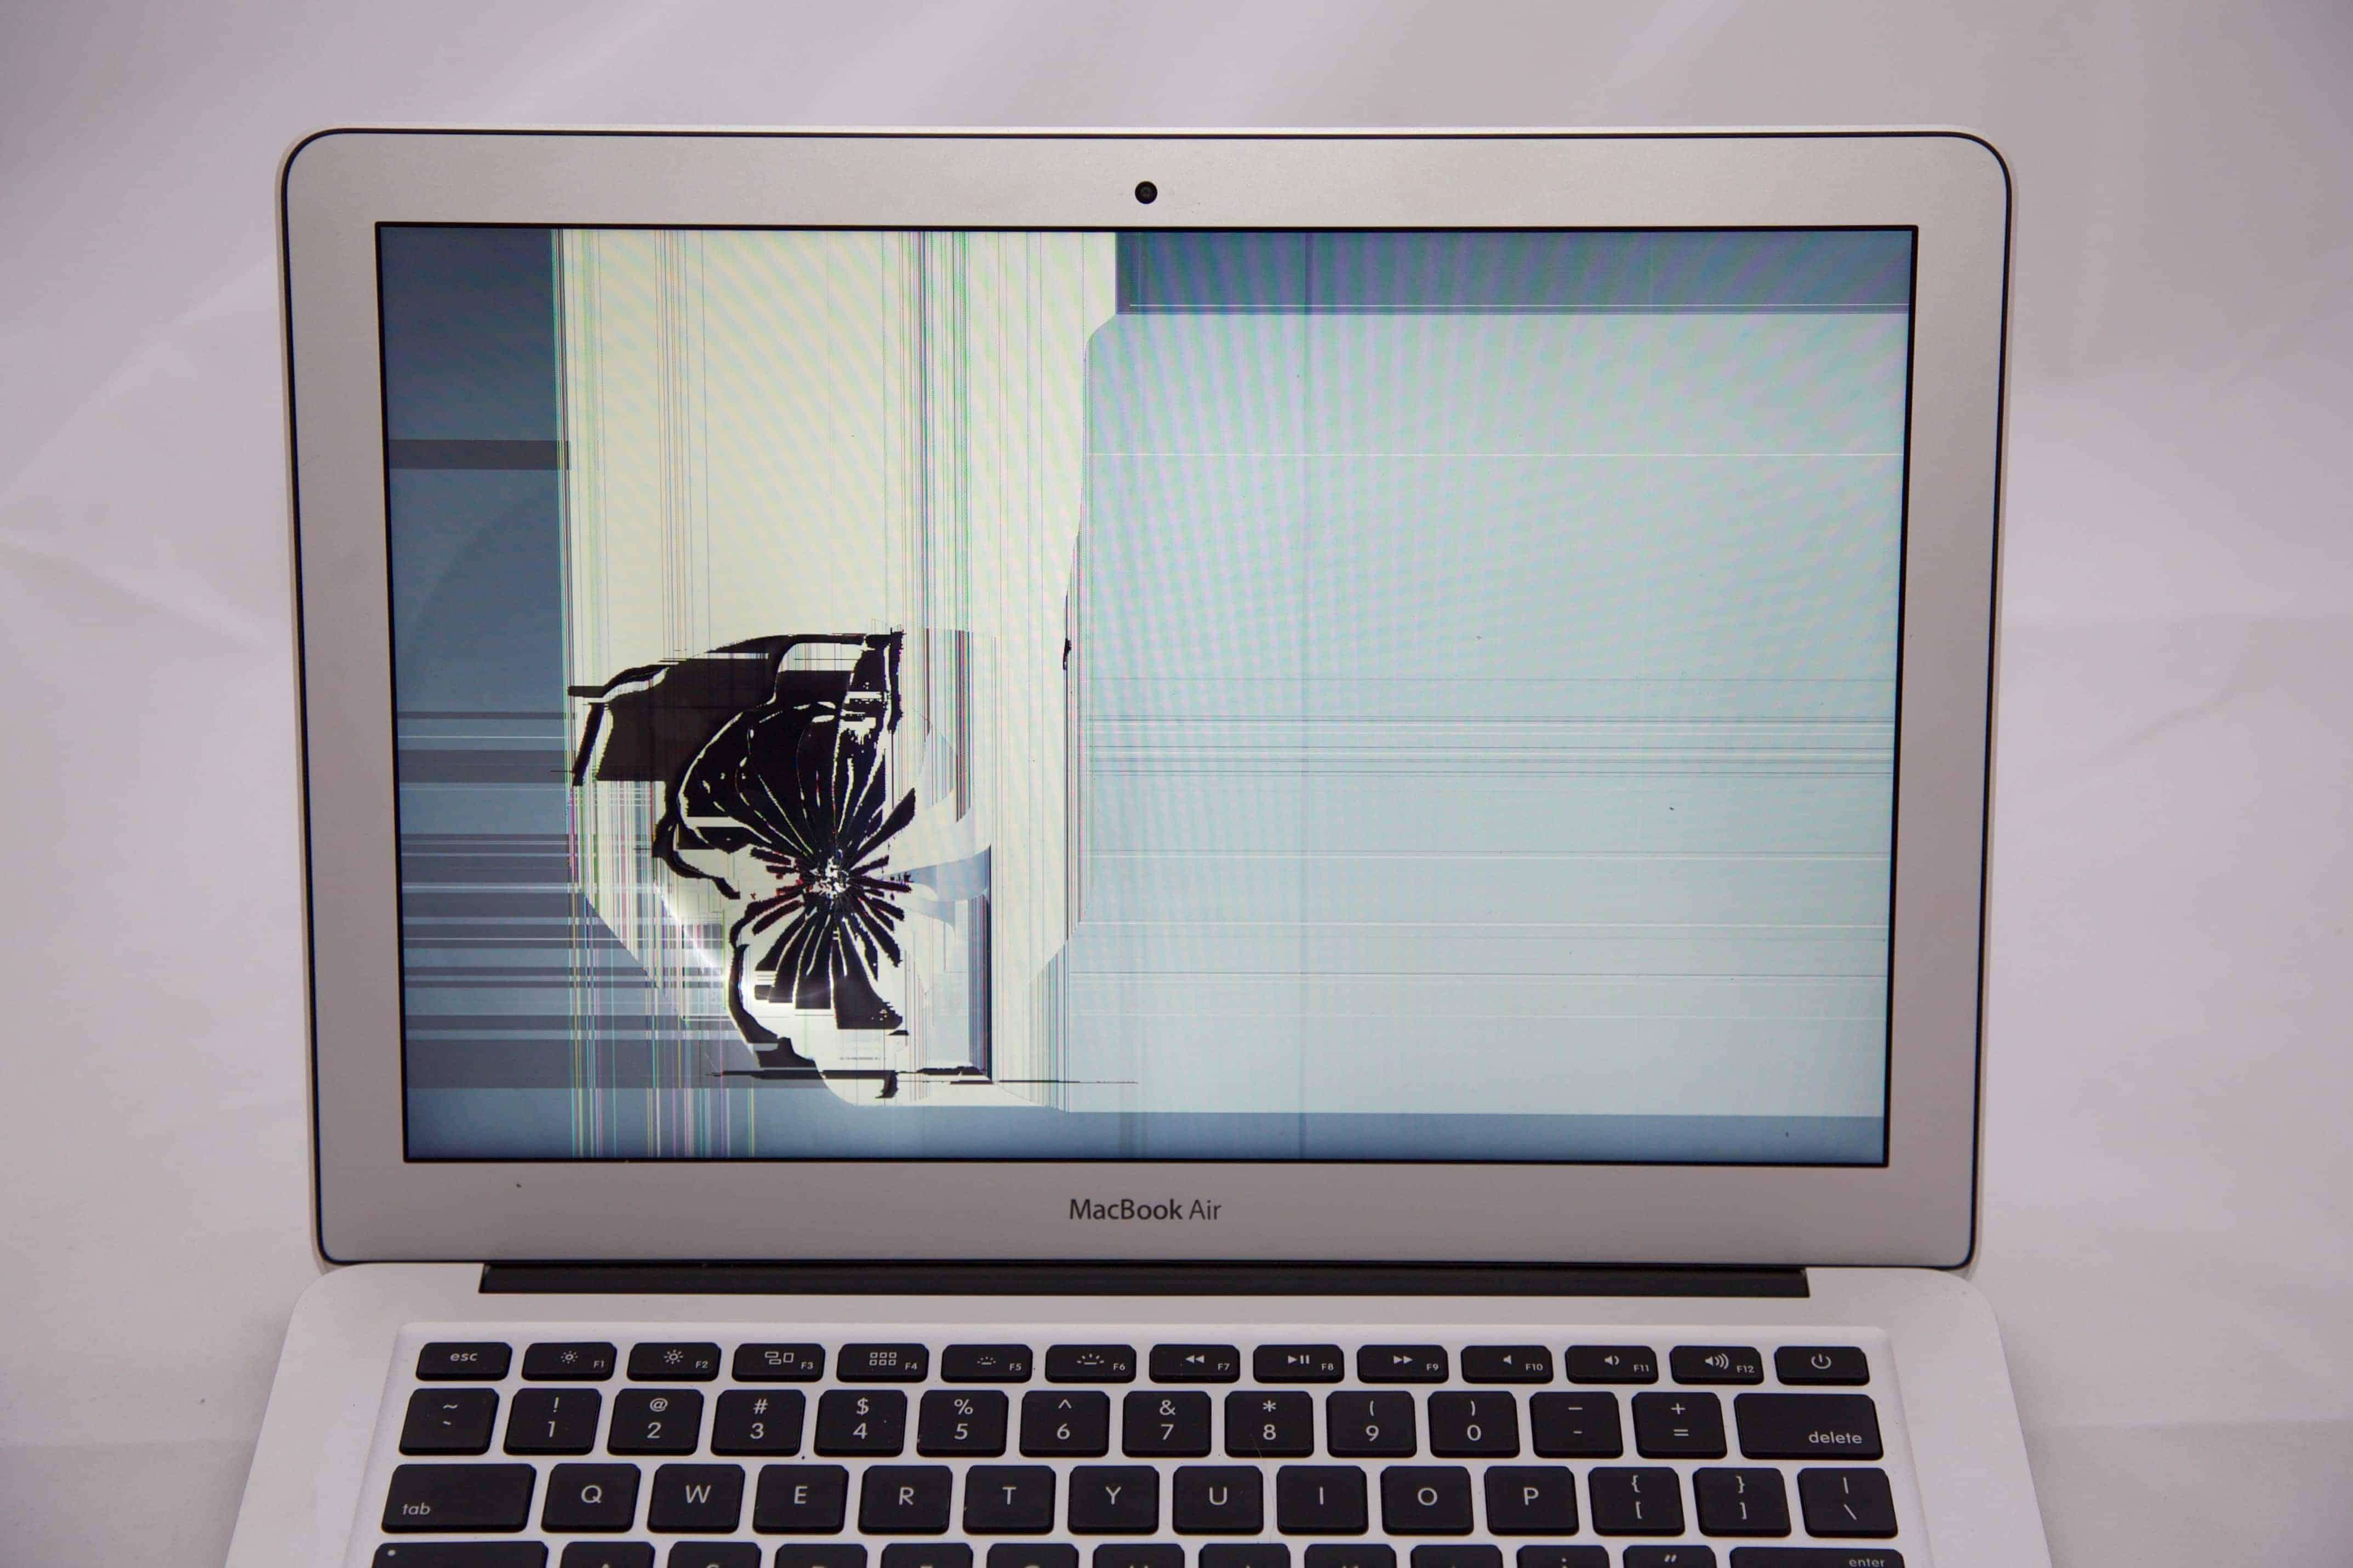 An Impact Damaged MacBook Air Screen - 24 hour turnaround